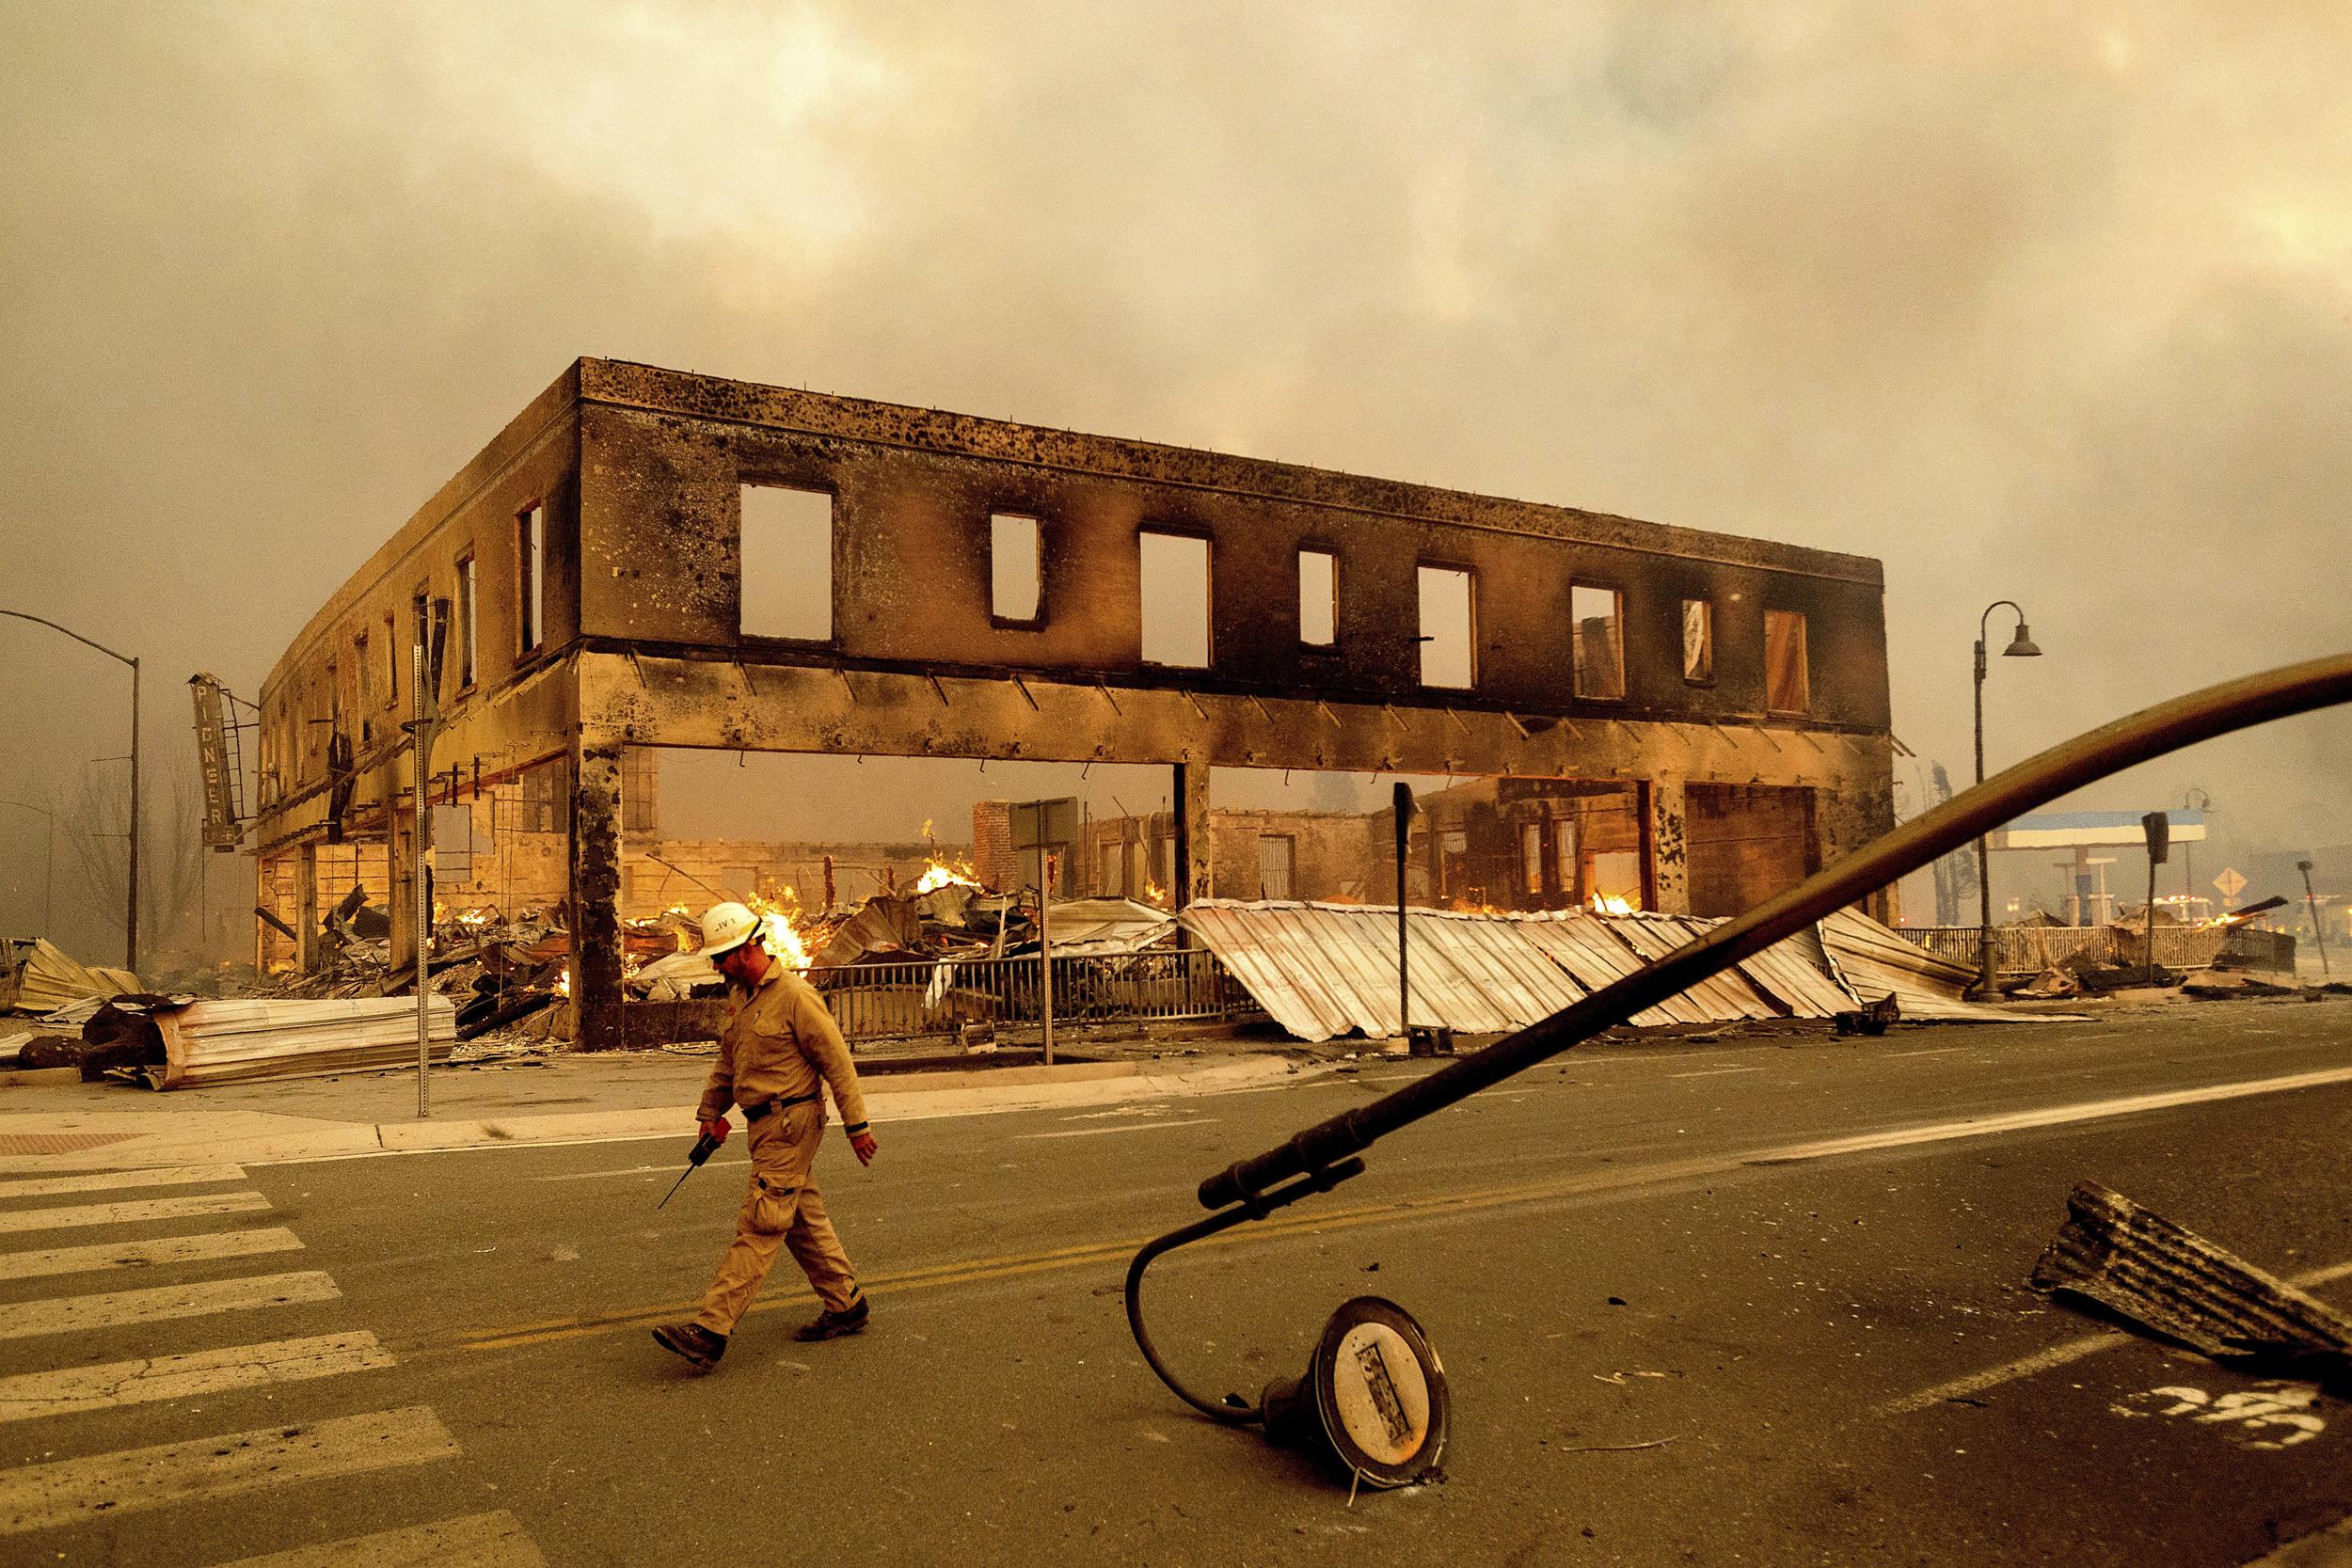 Video shows the Dixie Fire tearing through historic California town